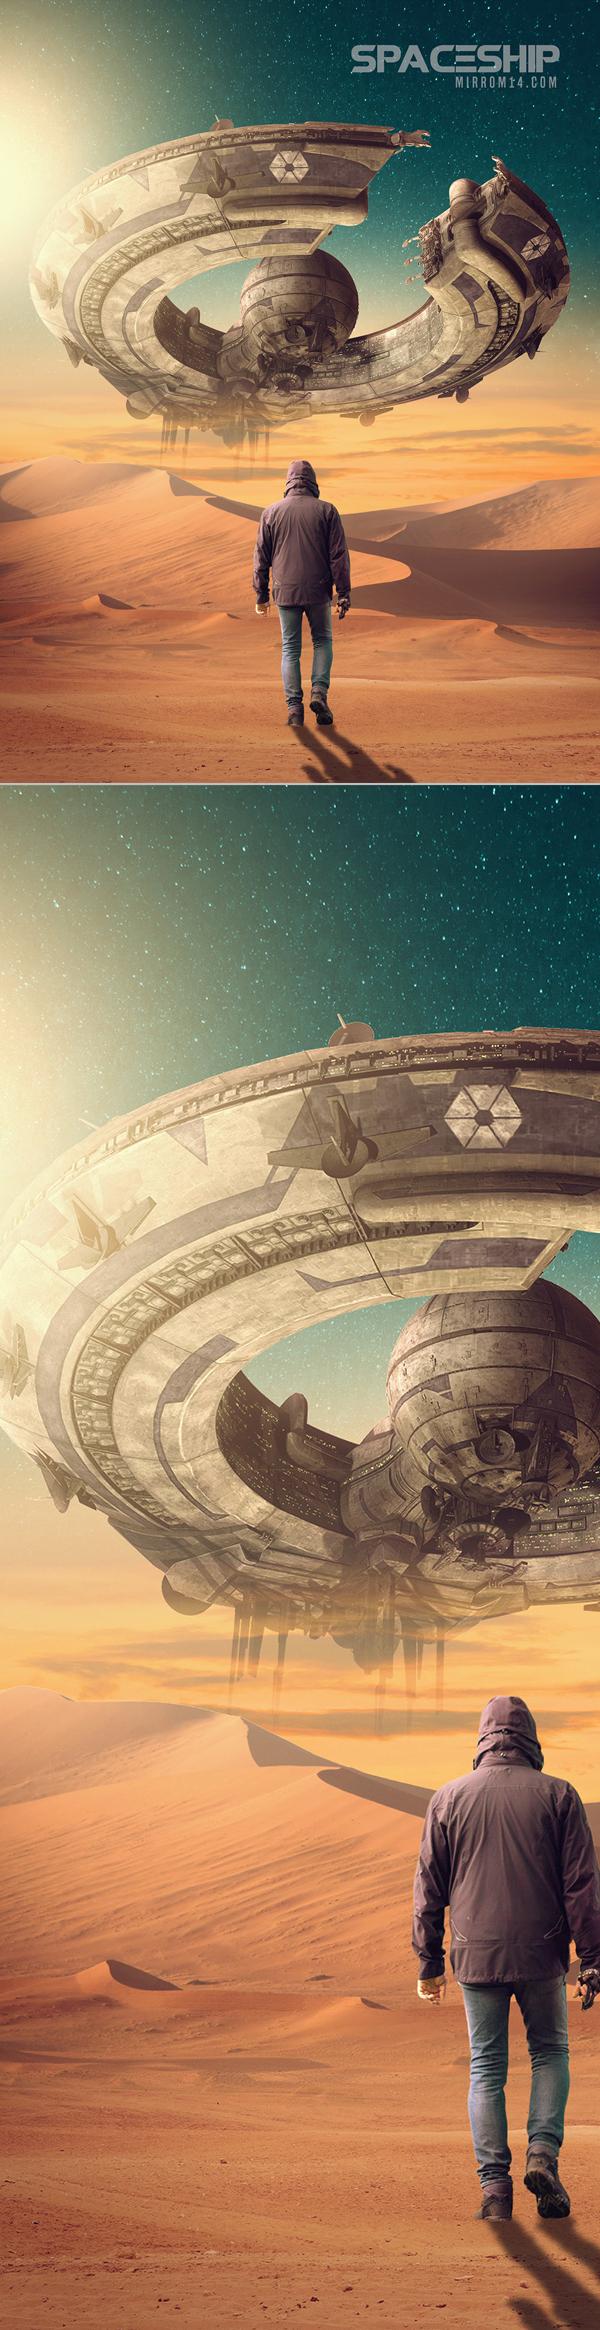 Create a Sci-Fi Fantasy Photo Manipulation in Adobe Photoshop